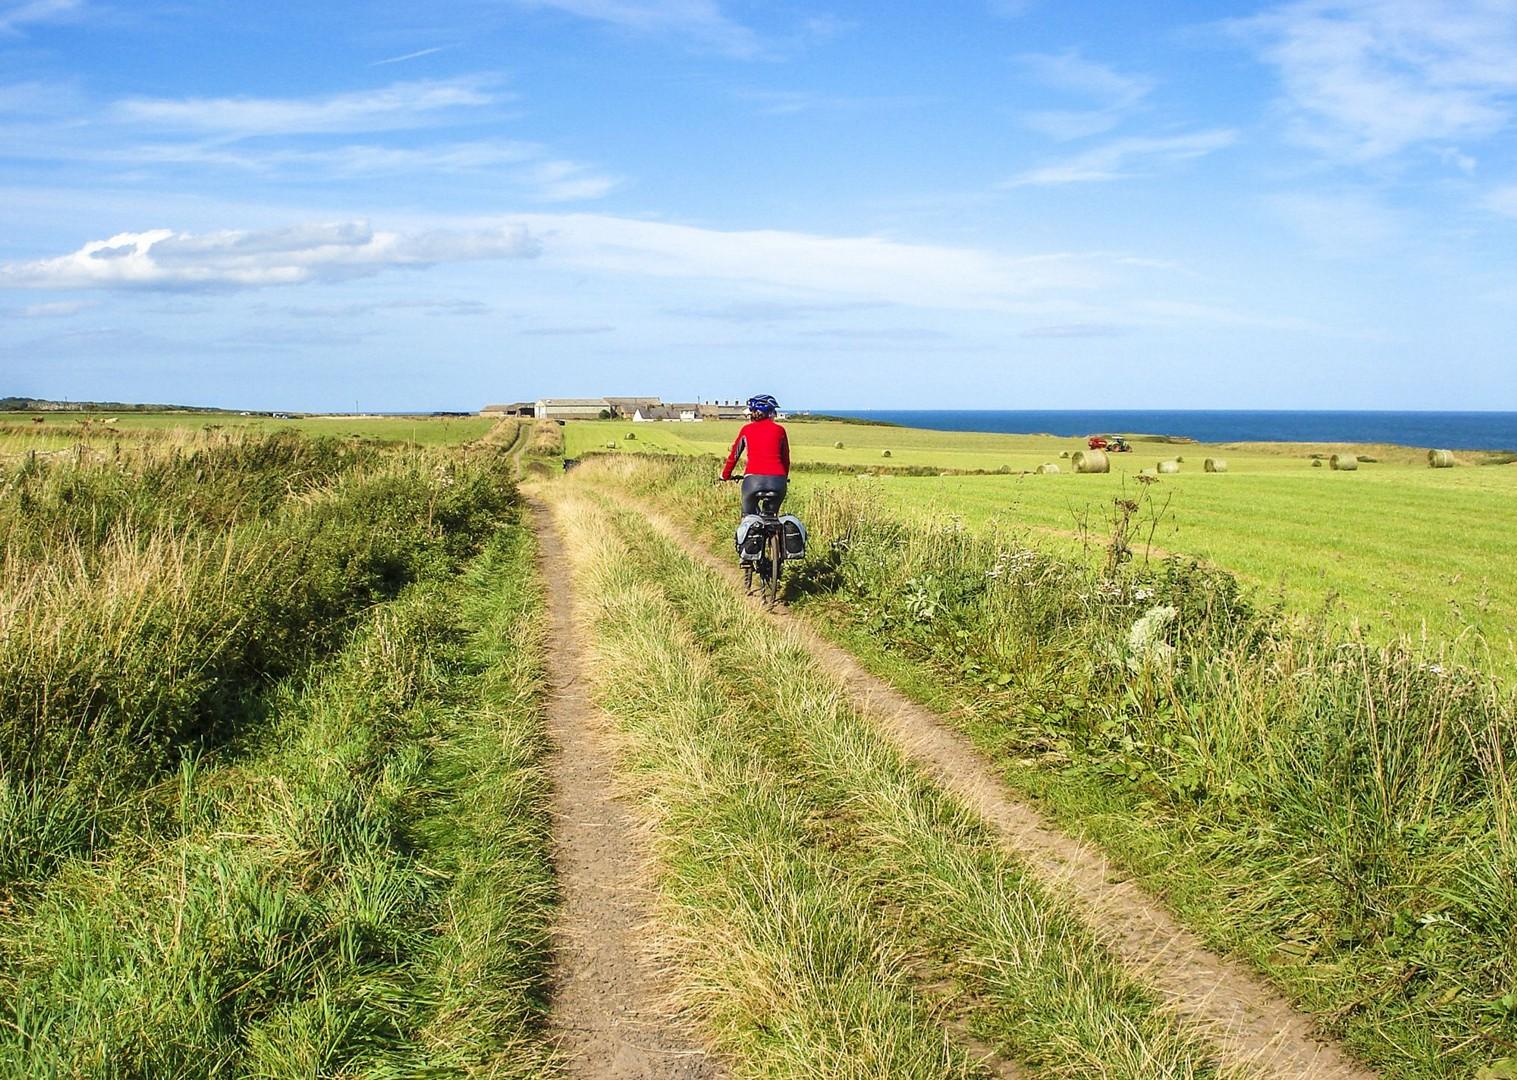 uk-coast-northumberland-cycling-rural-fields-tour-self-guided.jpg - UK - Northumberland - Alnmouth - Self-Guided Leisure Cycling Holiday - Leisure Cycling